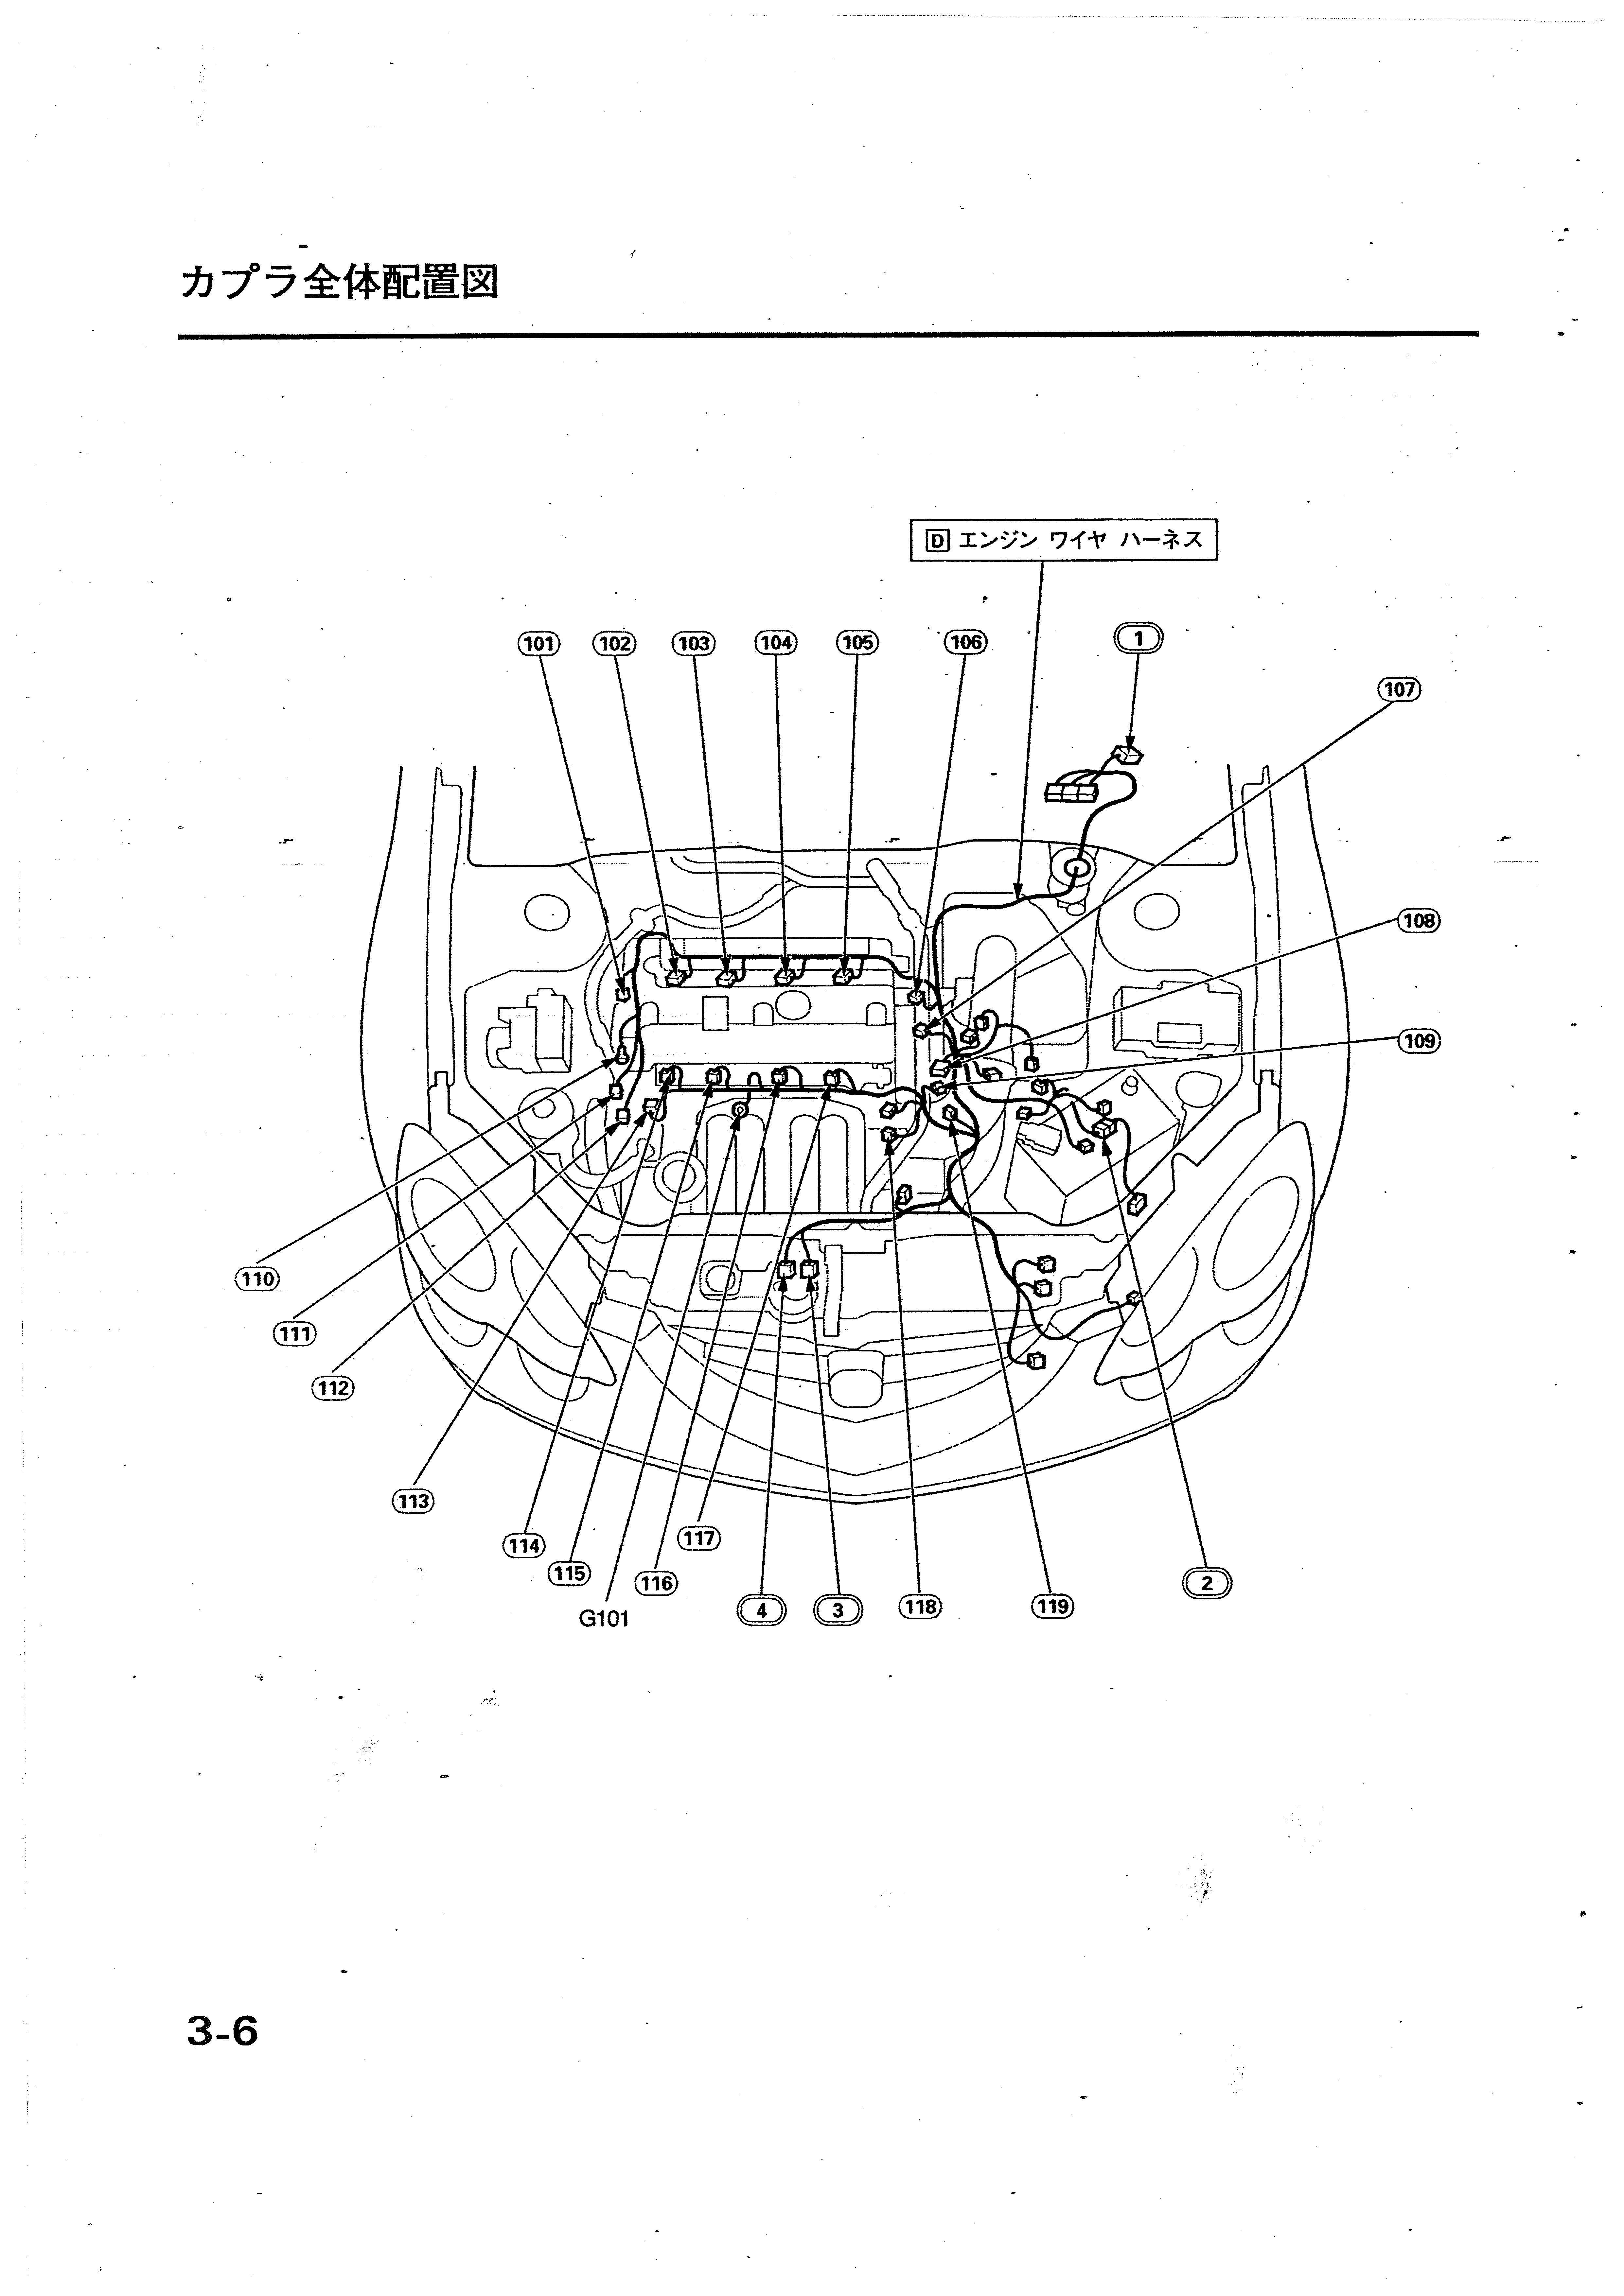 Wiring Diagram Honda K20a